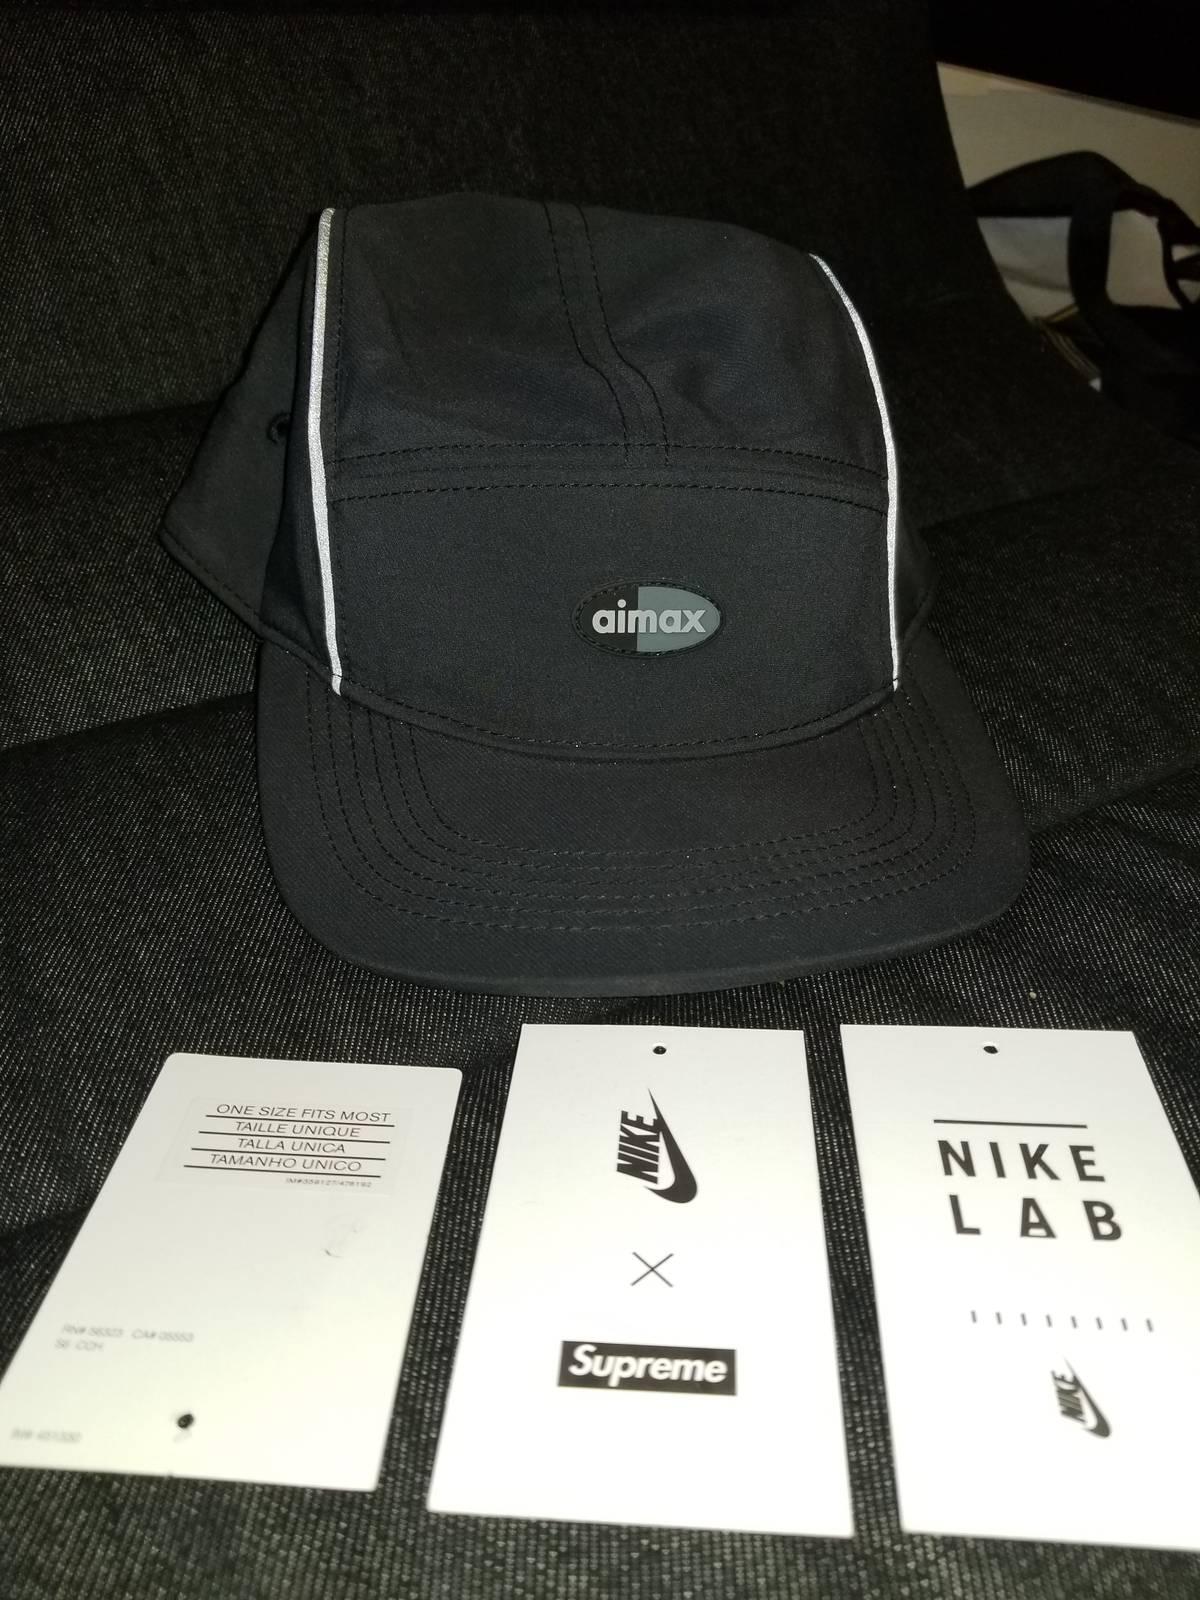 b215b38f Supreme × Nike ×. Supreme X Nike Air Max Running Hat in Black. Size: ONE  SIZE